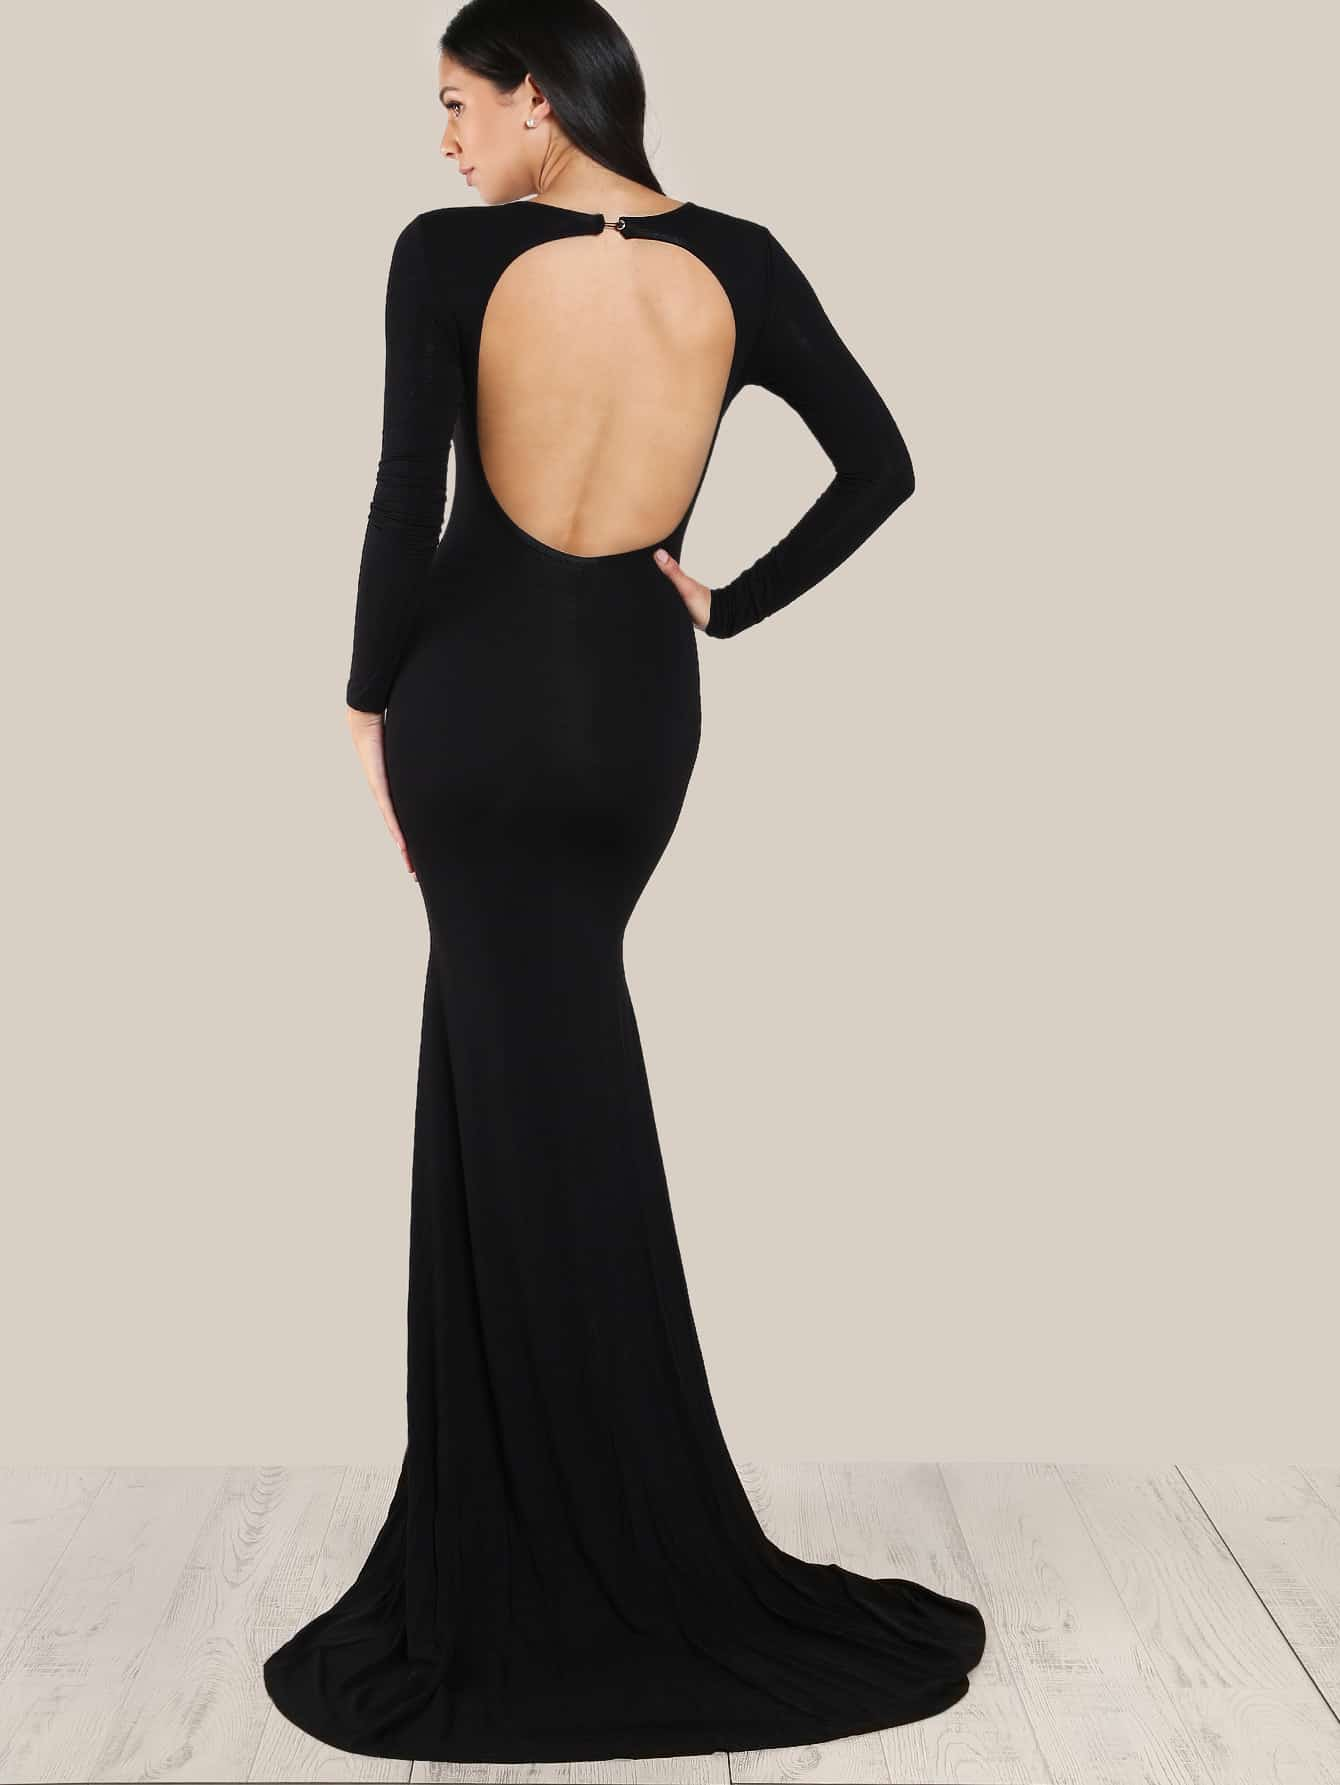 Open Back Form Fitting Fishtail Dress metallic form fitting dress